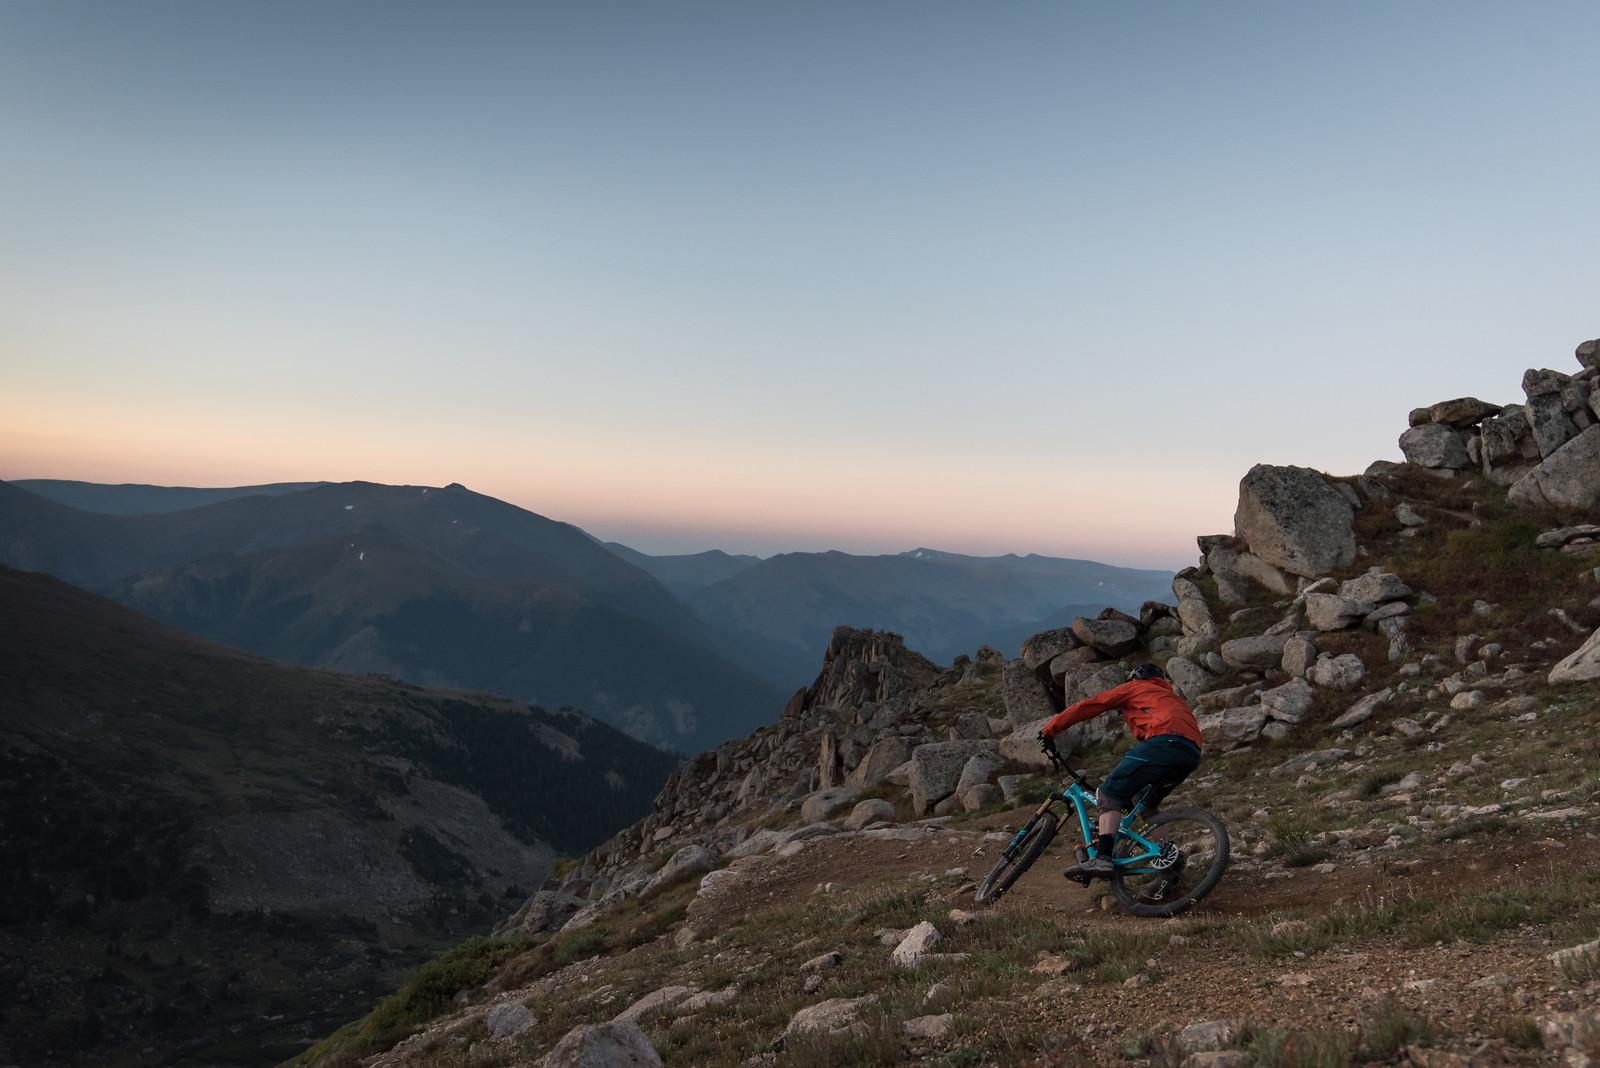 Alpine Sunrise Selfie - russellpj - Mountain Biking Pictures - Vital MTB